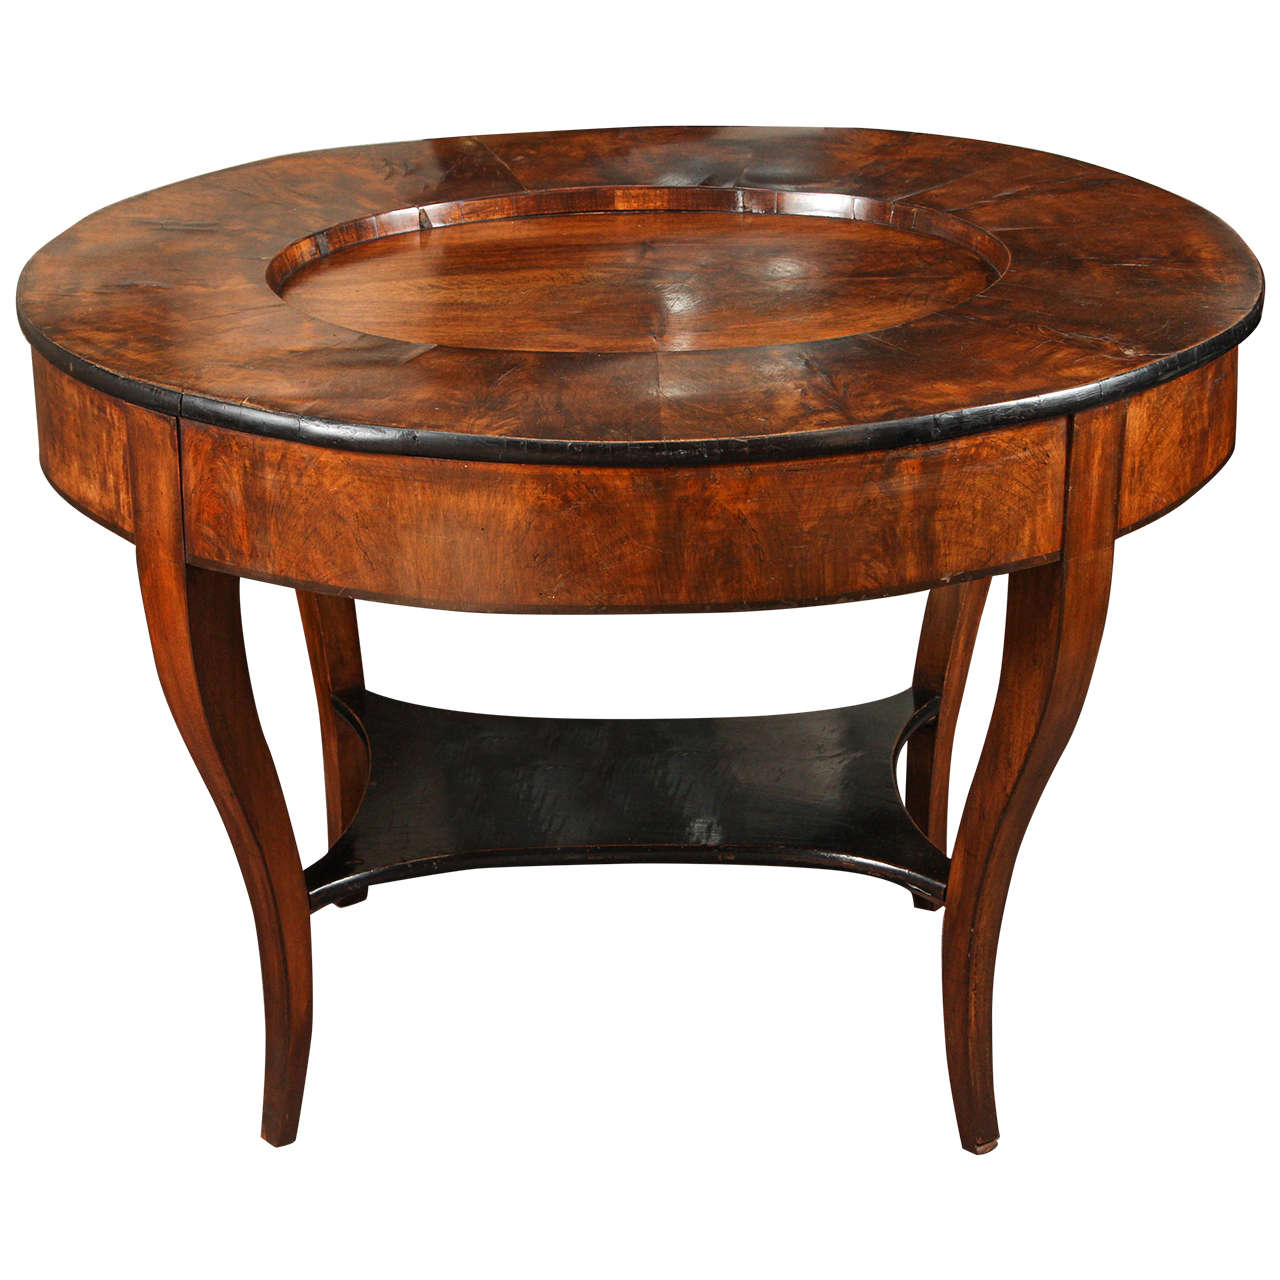 Early 20th Century Georgian Tray Top Coffee Burl Wood Side or Coffee Table